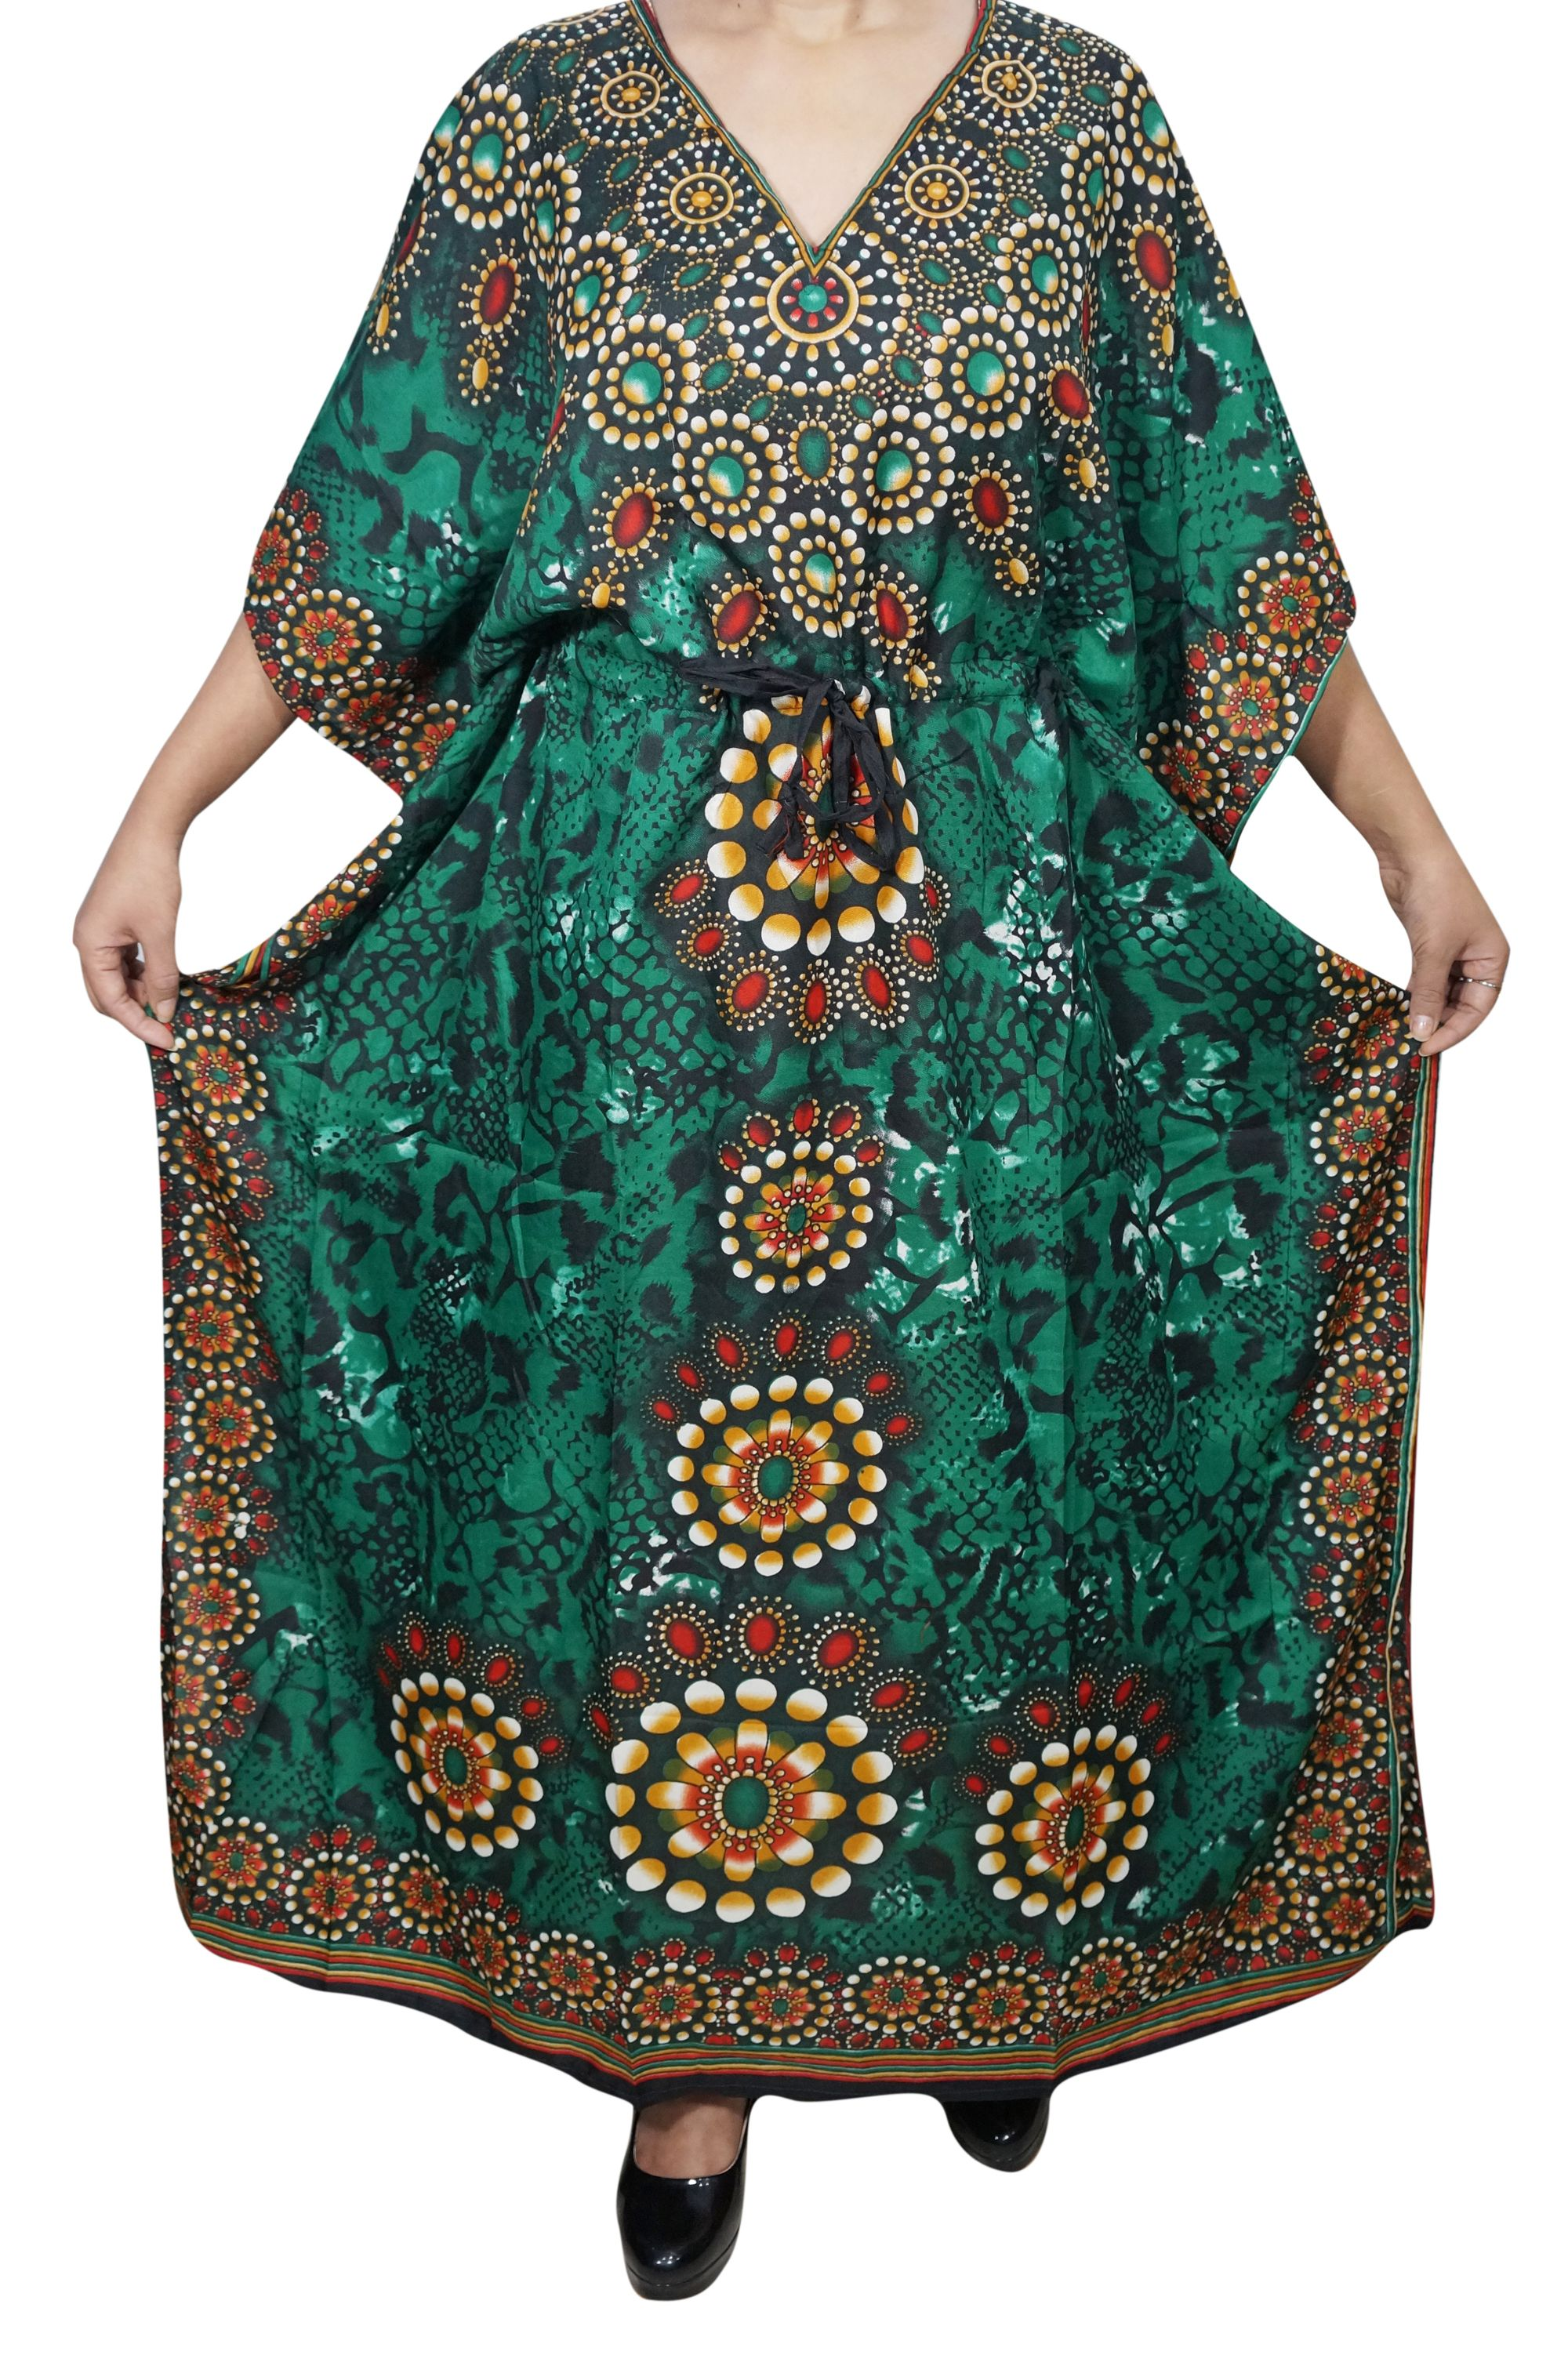 7ea2ce2235 Buy Mogul Womens Kimono Caftan Dress Green Printed Bikini Cover Up  Comfortable Nightgown XXXL at Walmart.com